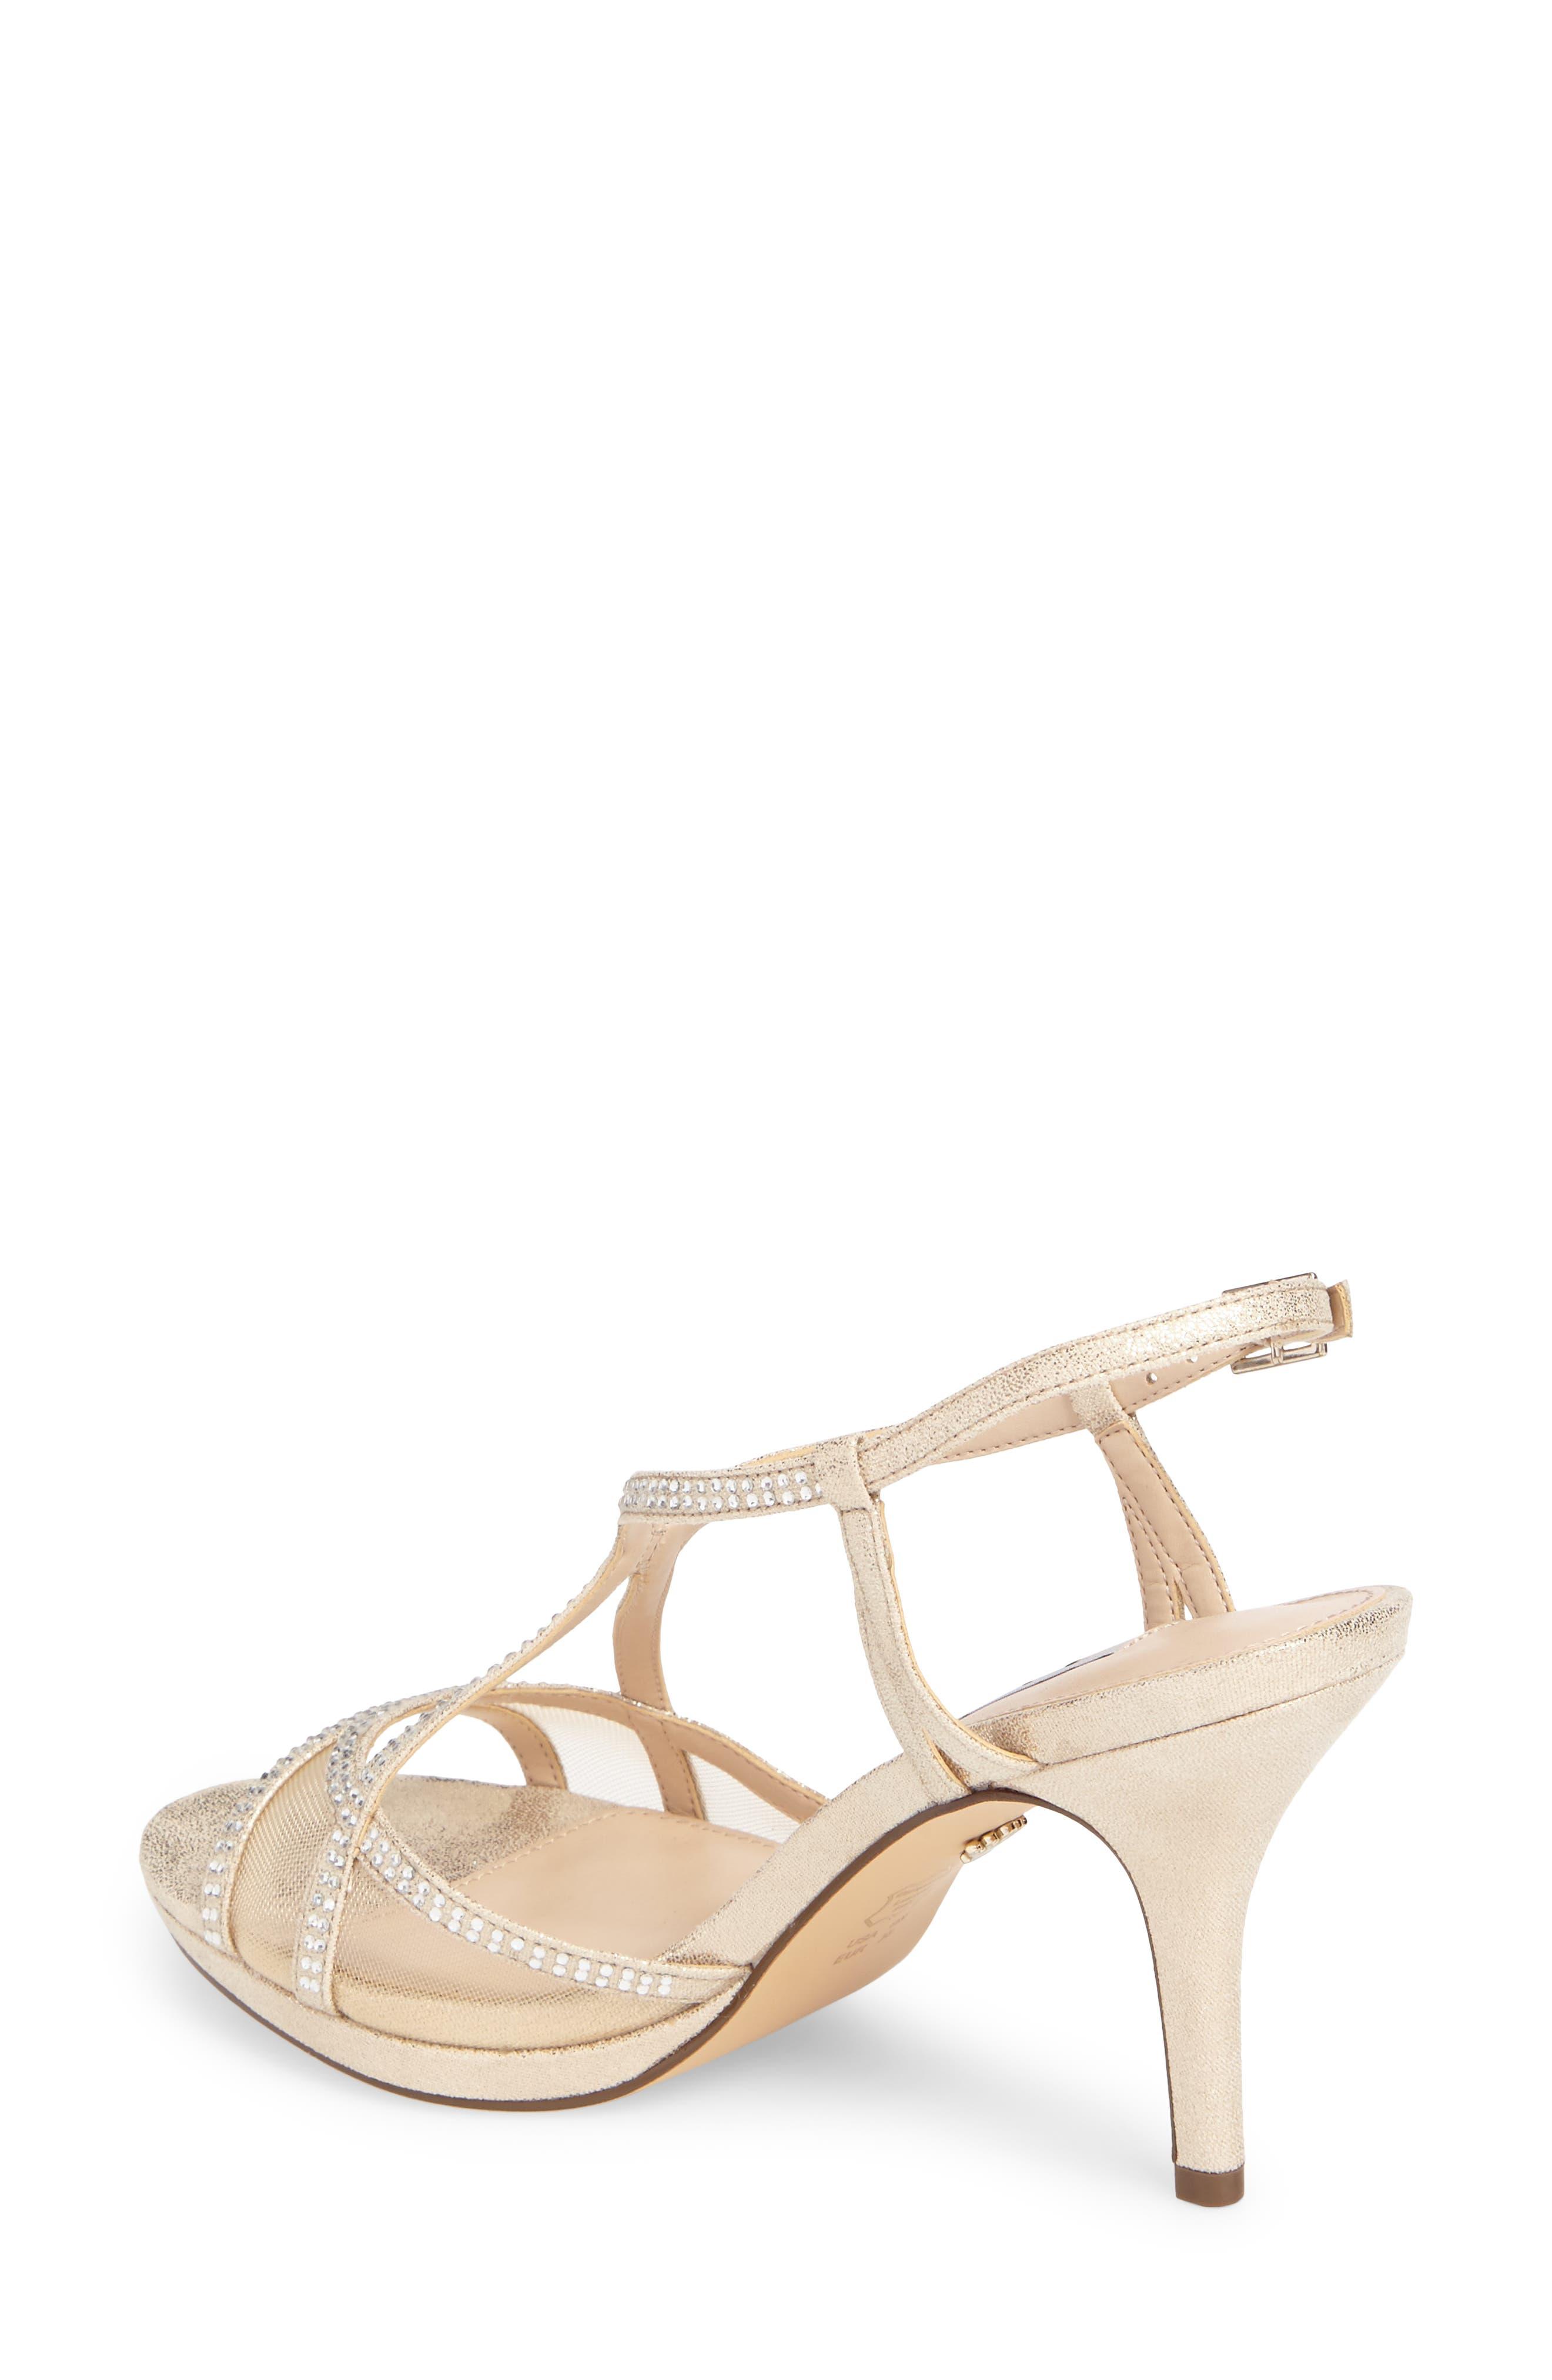 Blossom Crystal Embellished Sandal,                             Alternate thumbnail 2, color,                             Gold Fabric